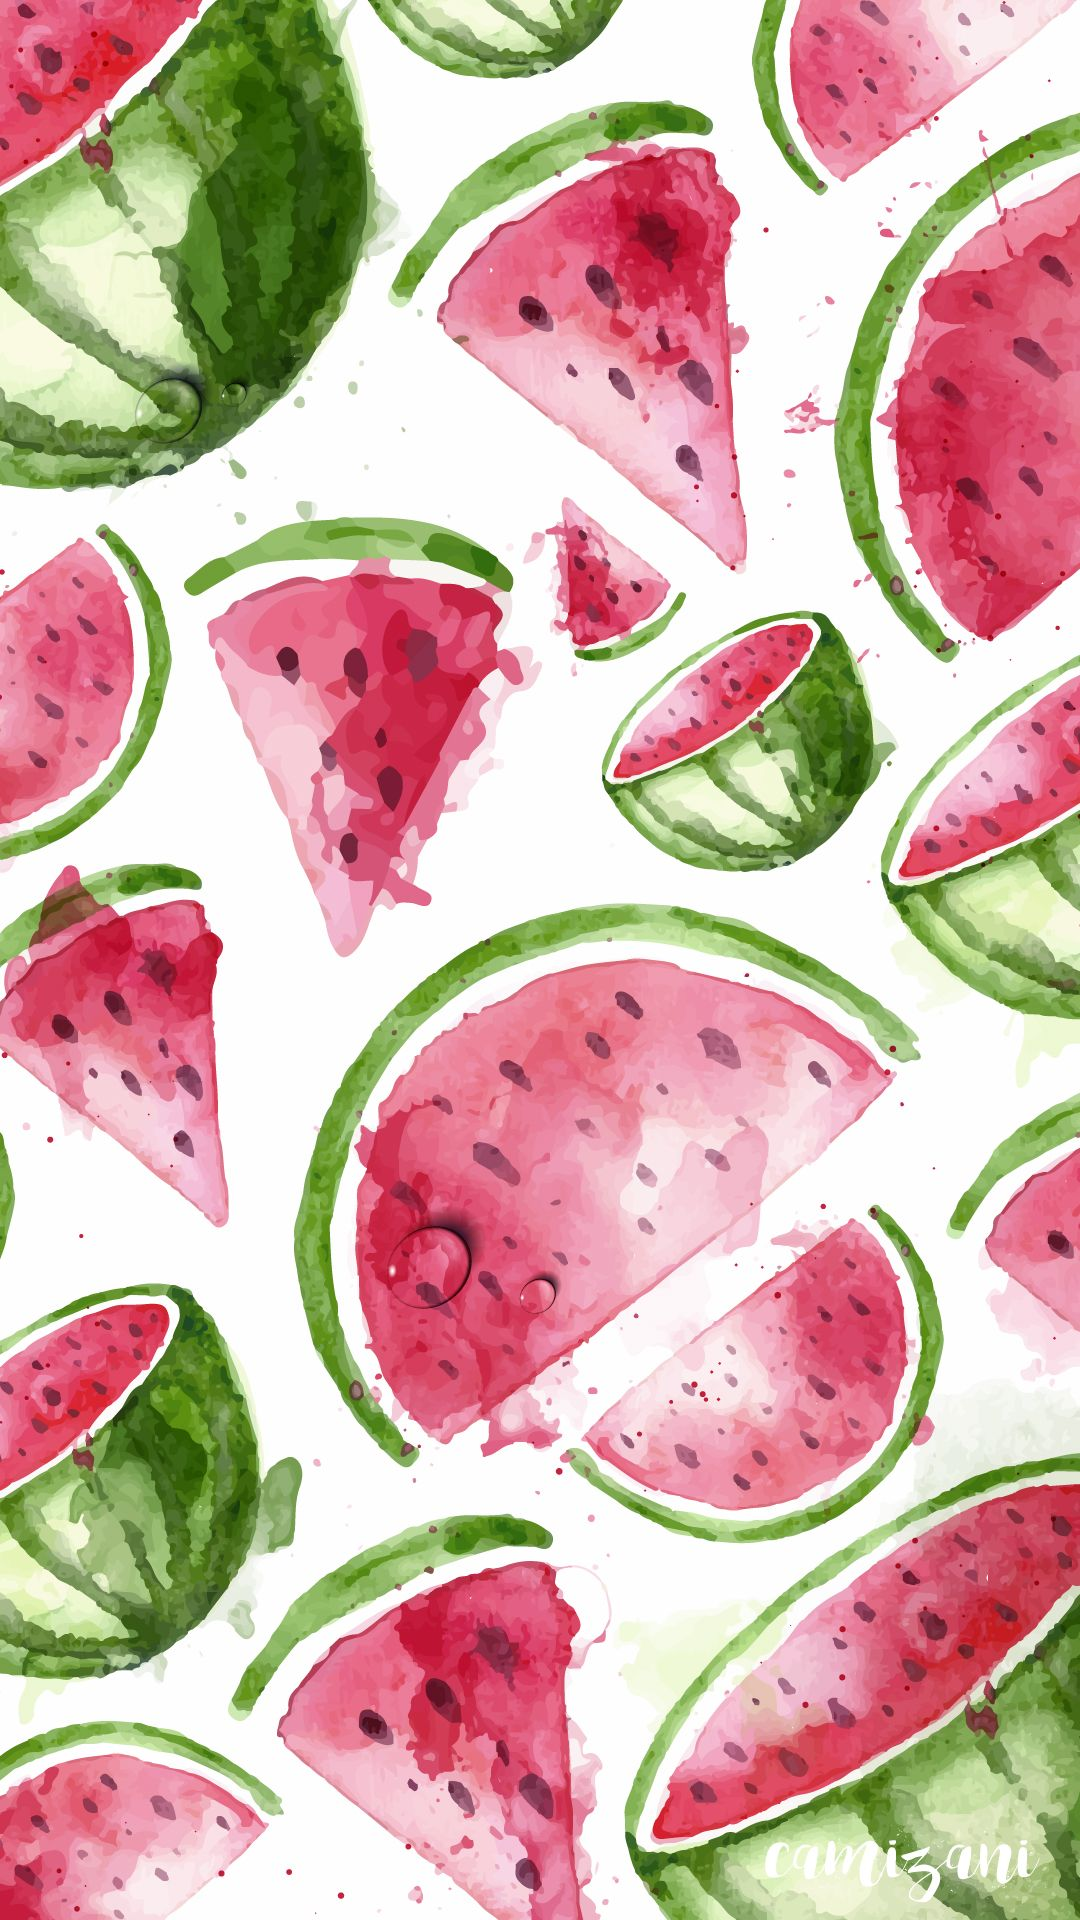 Camizani Watermelon Iphone Wallpaper Wallpaper ️